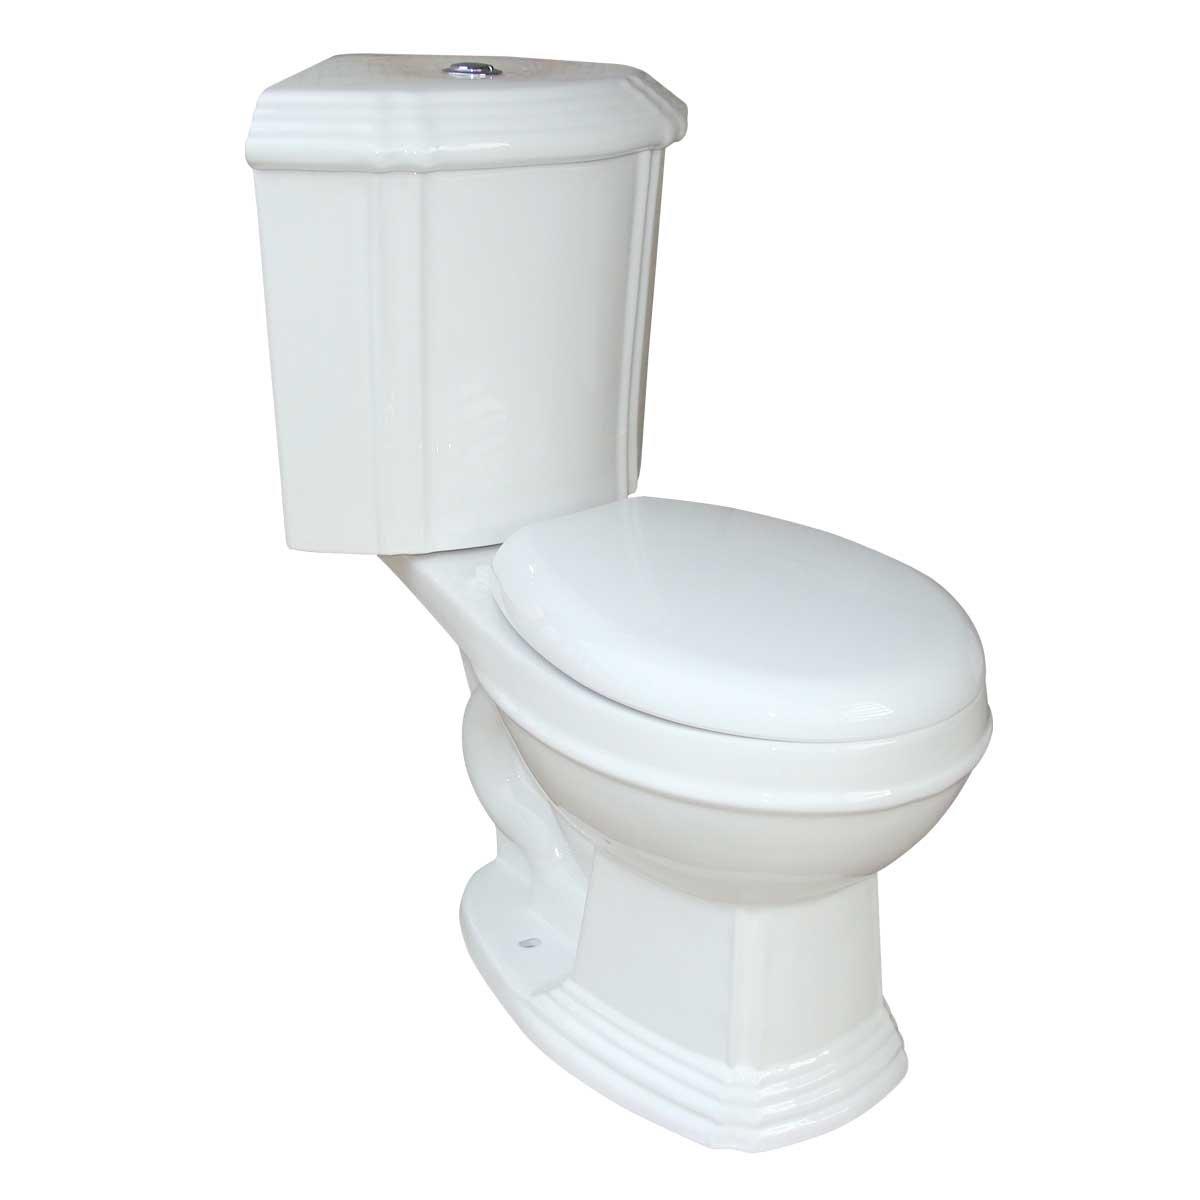 White Ceramic Round Space Saving Dual Flush Corner Toilet Renovator's Supply by Renovators Supply Manufacturing